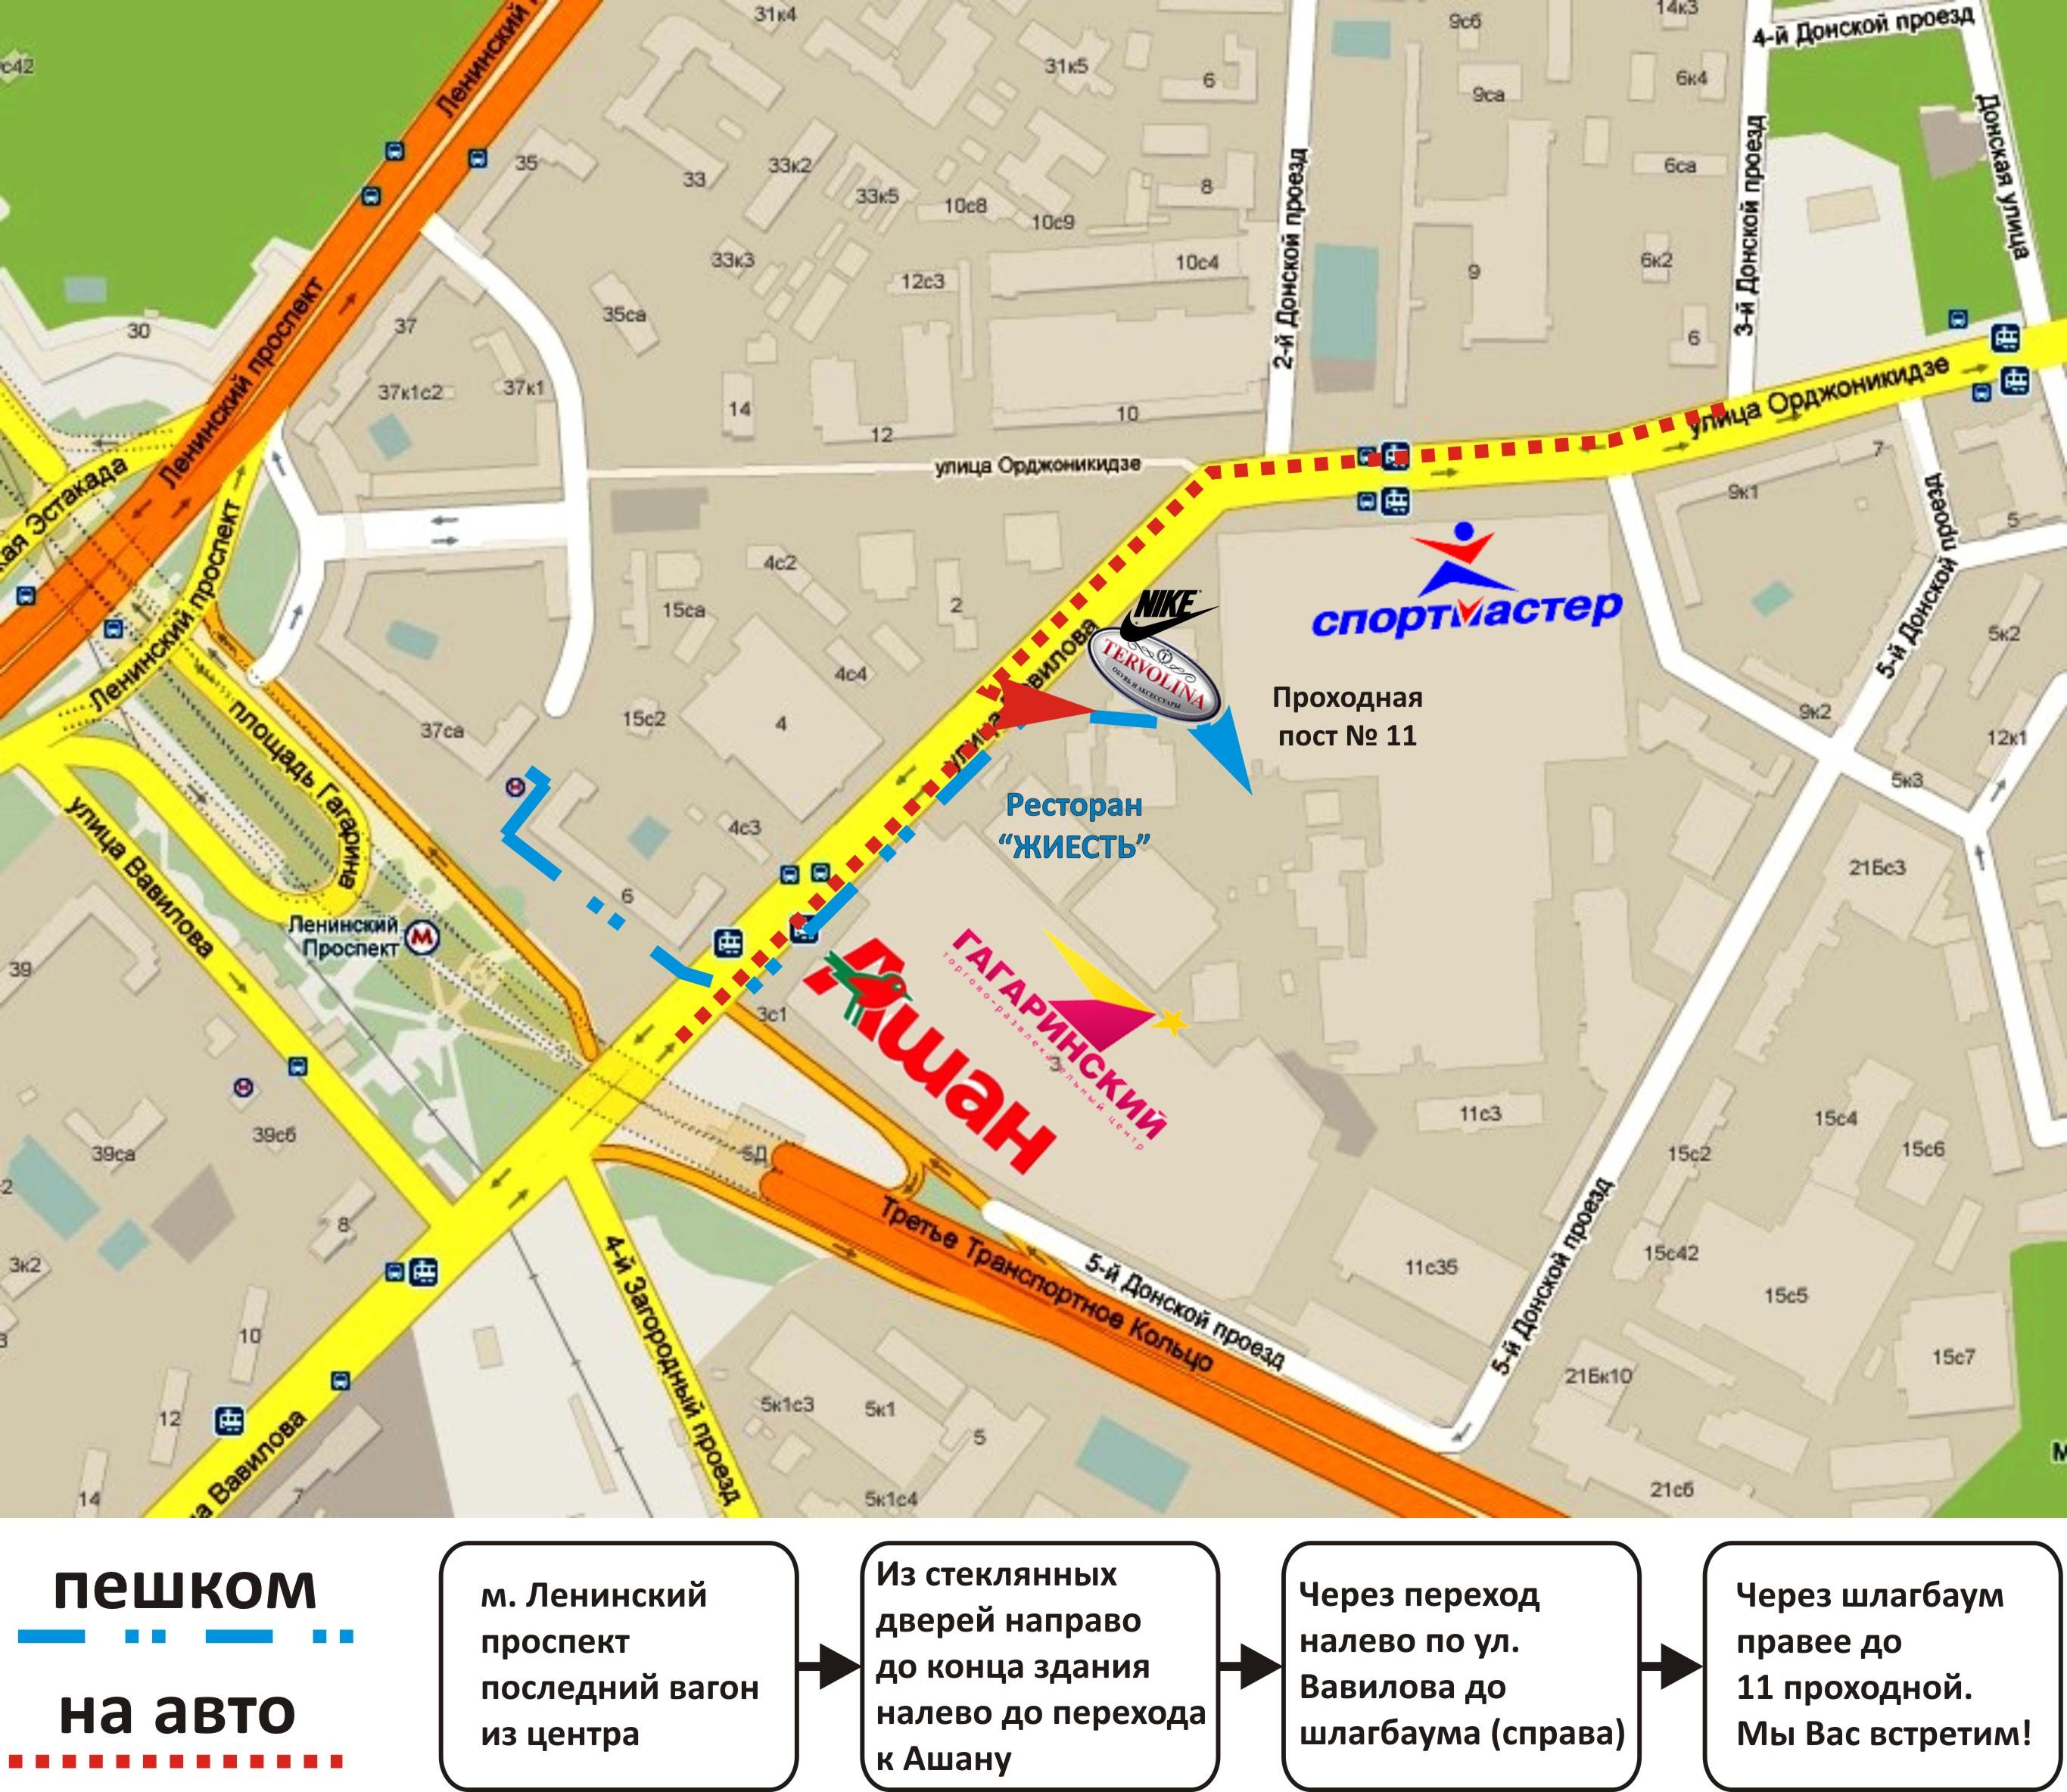 Ленинский проспект метро схема метро